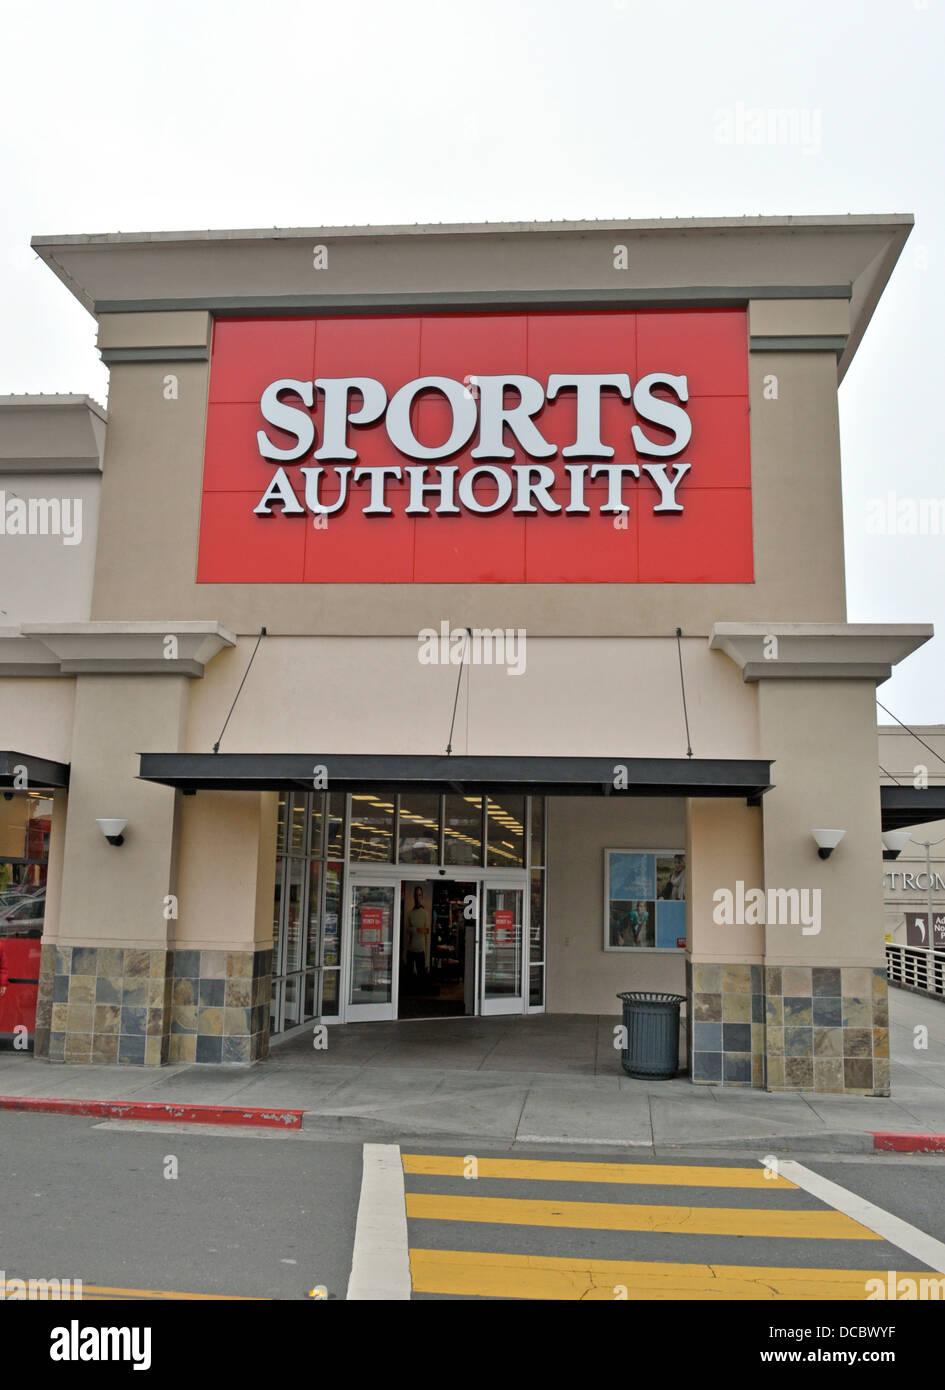 Sports Authority store Photo Stock